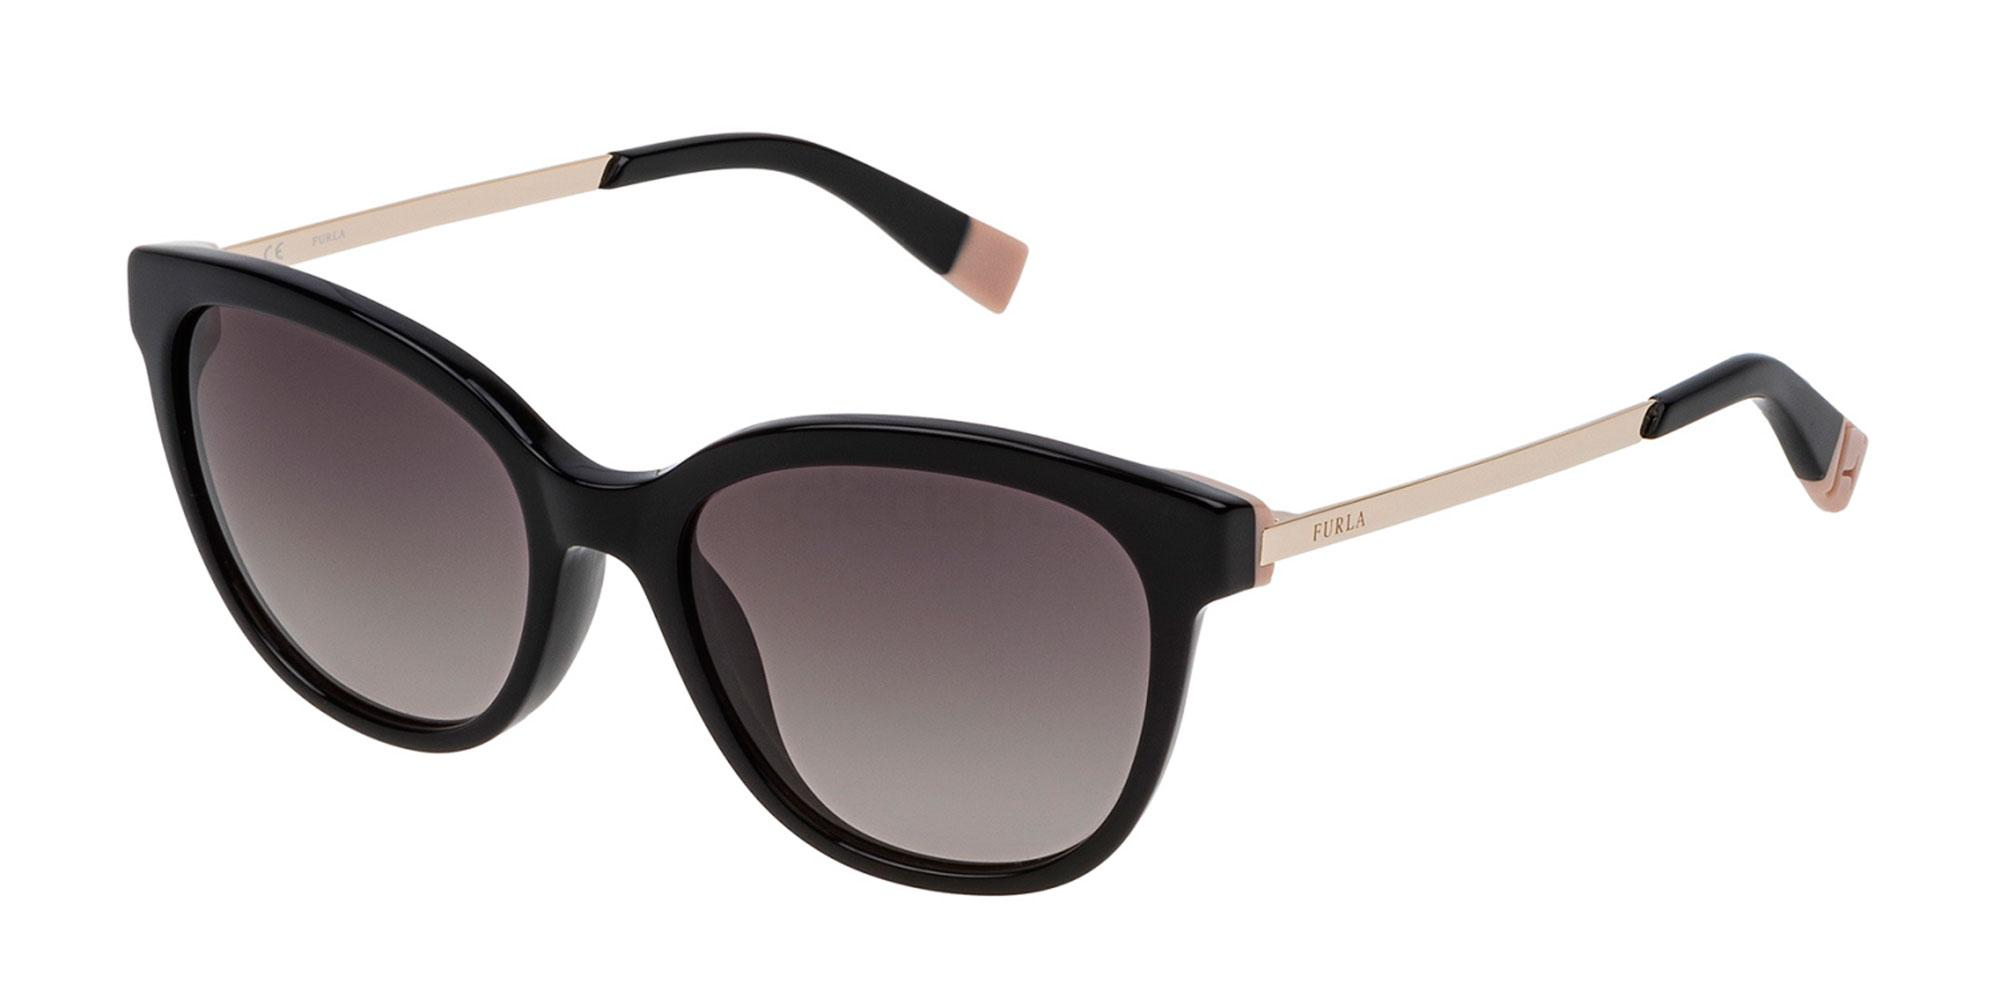 0700 SFU045 Sunglasses, Furla